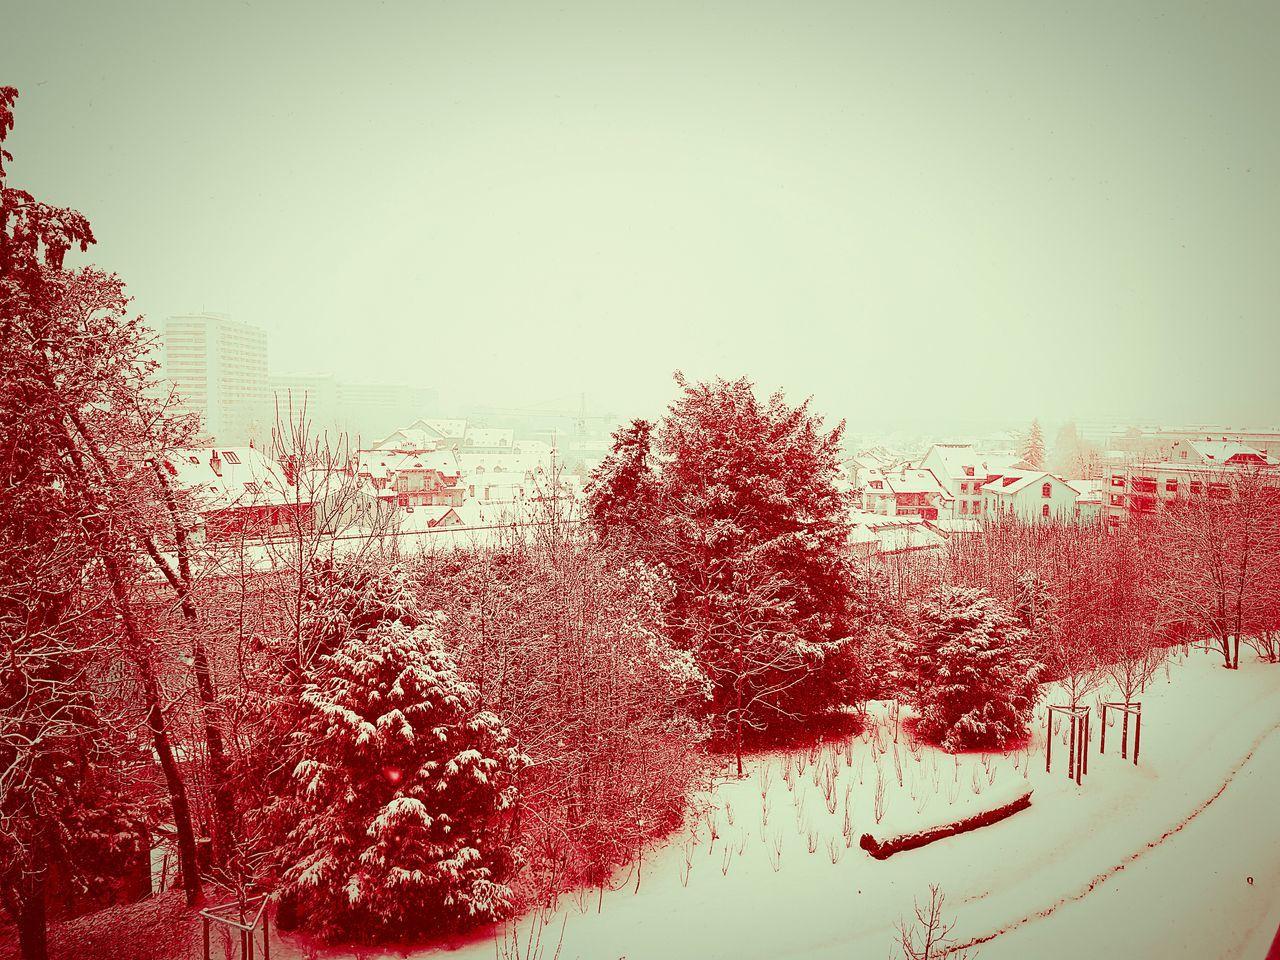 Geneva Geneve Snow ❄ Snowing Winter Cold Temperature Landscape EyeEm Nature Lover EyeEm Best Shots EyeEm EyeEm Best Shots - Nature EyeEm Gallery EyeEmNewHere